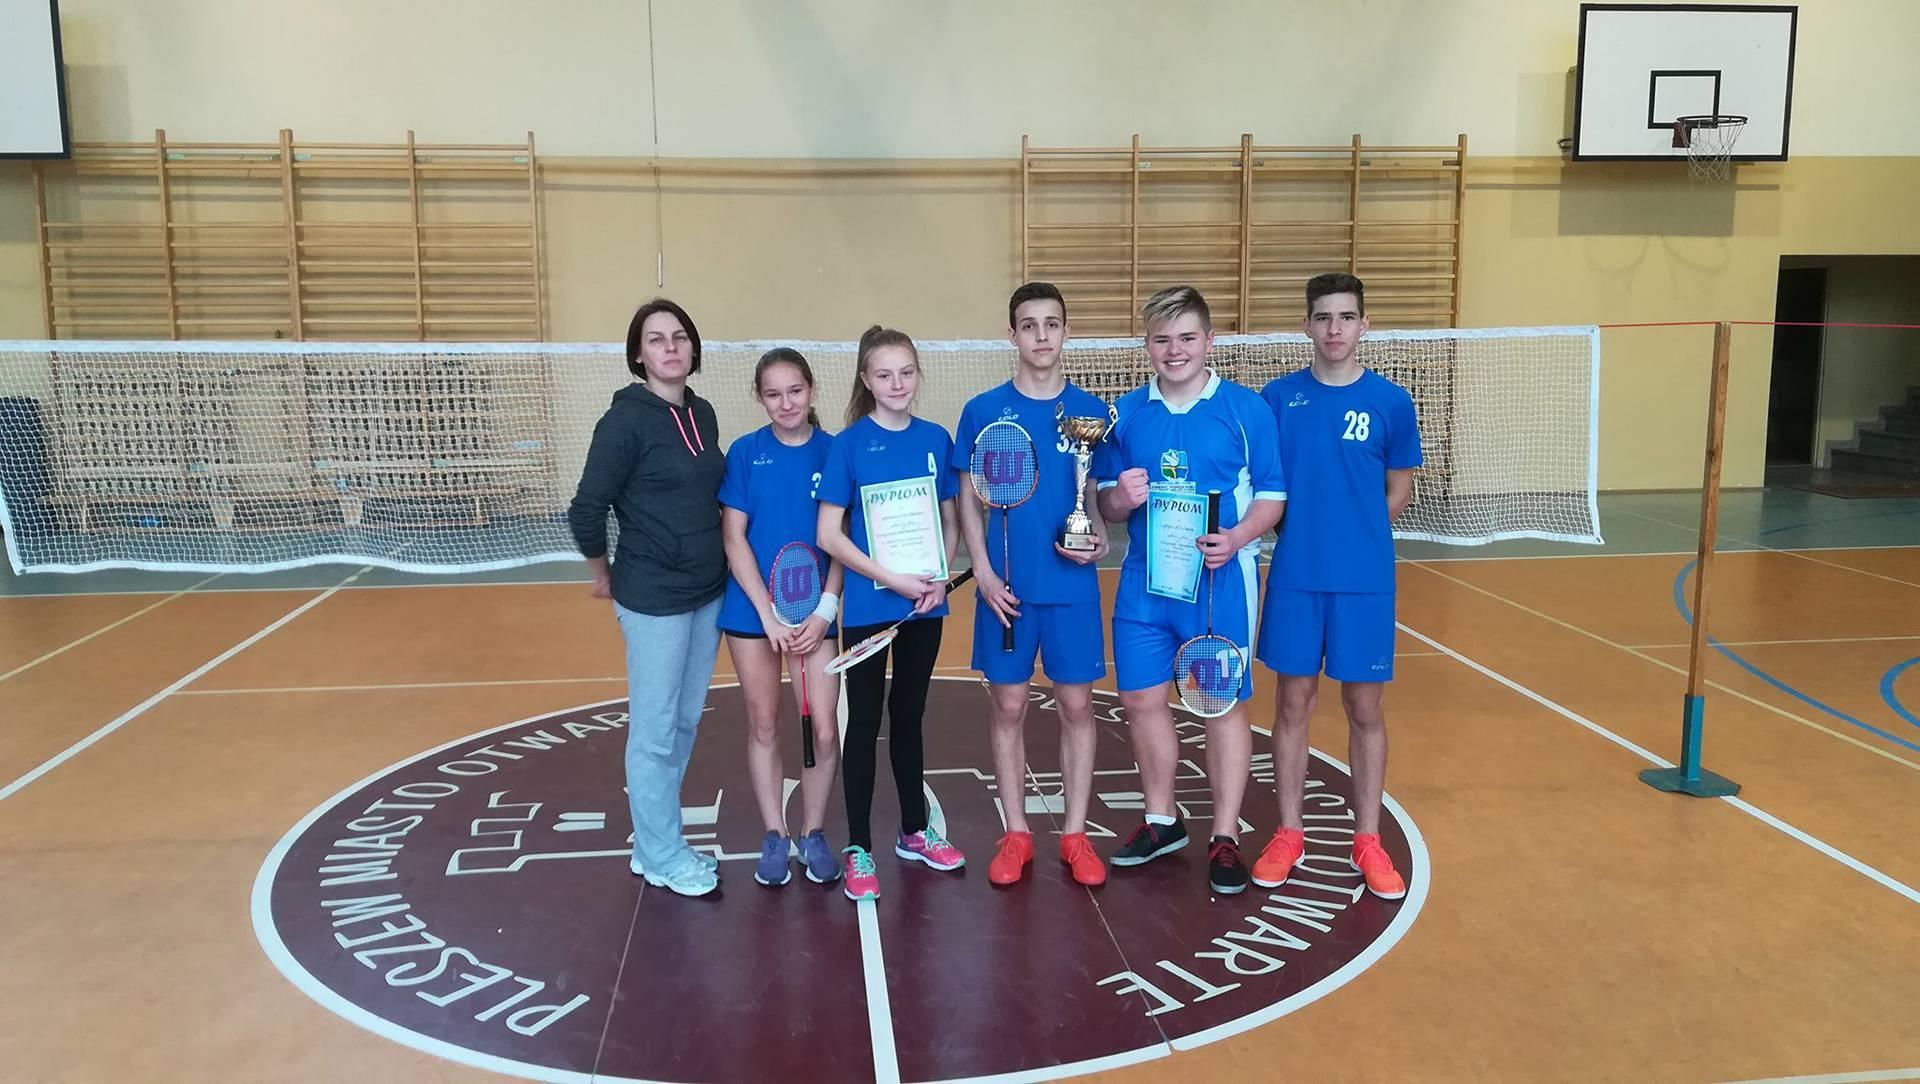 Sukcesy badmintonistów